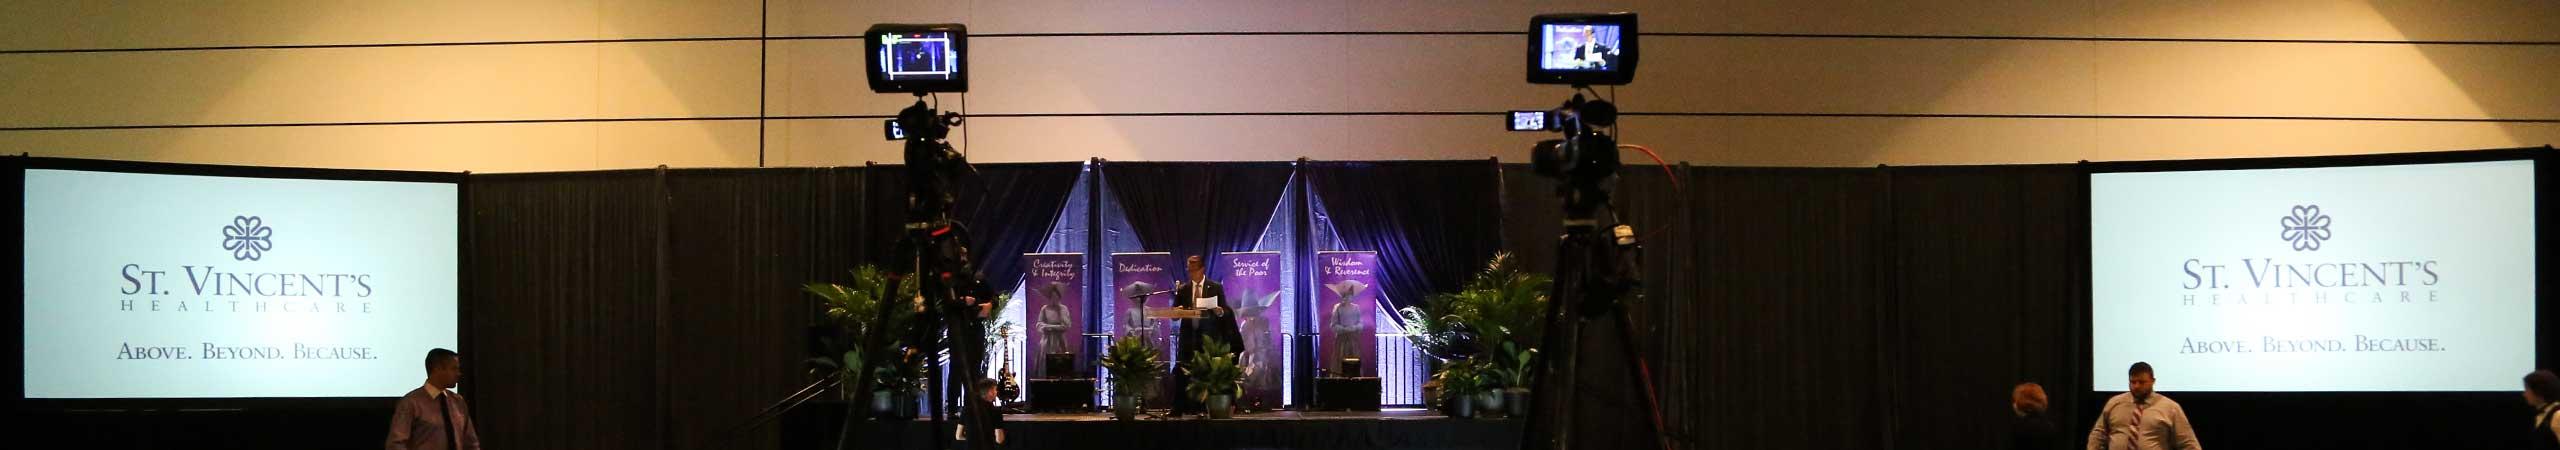 Jacksonville, FL Presentation & Stage Rentals